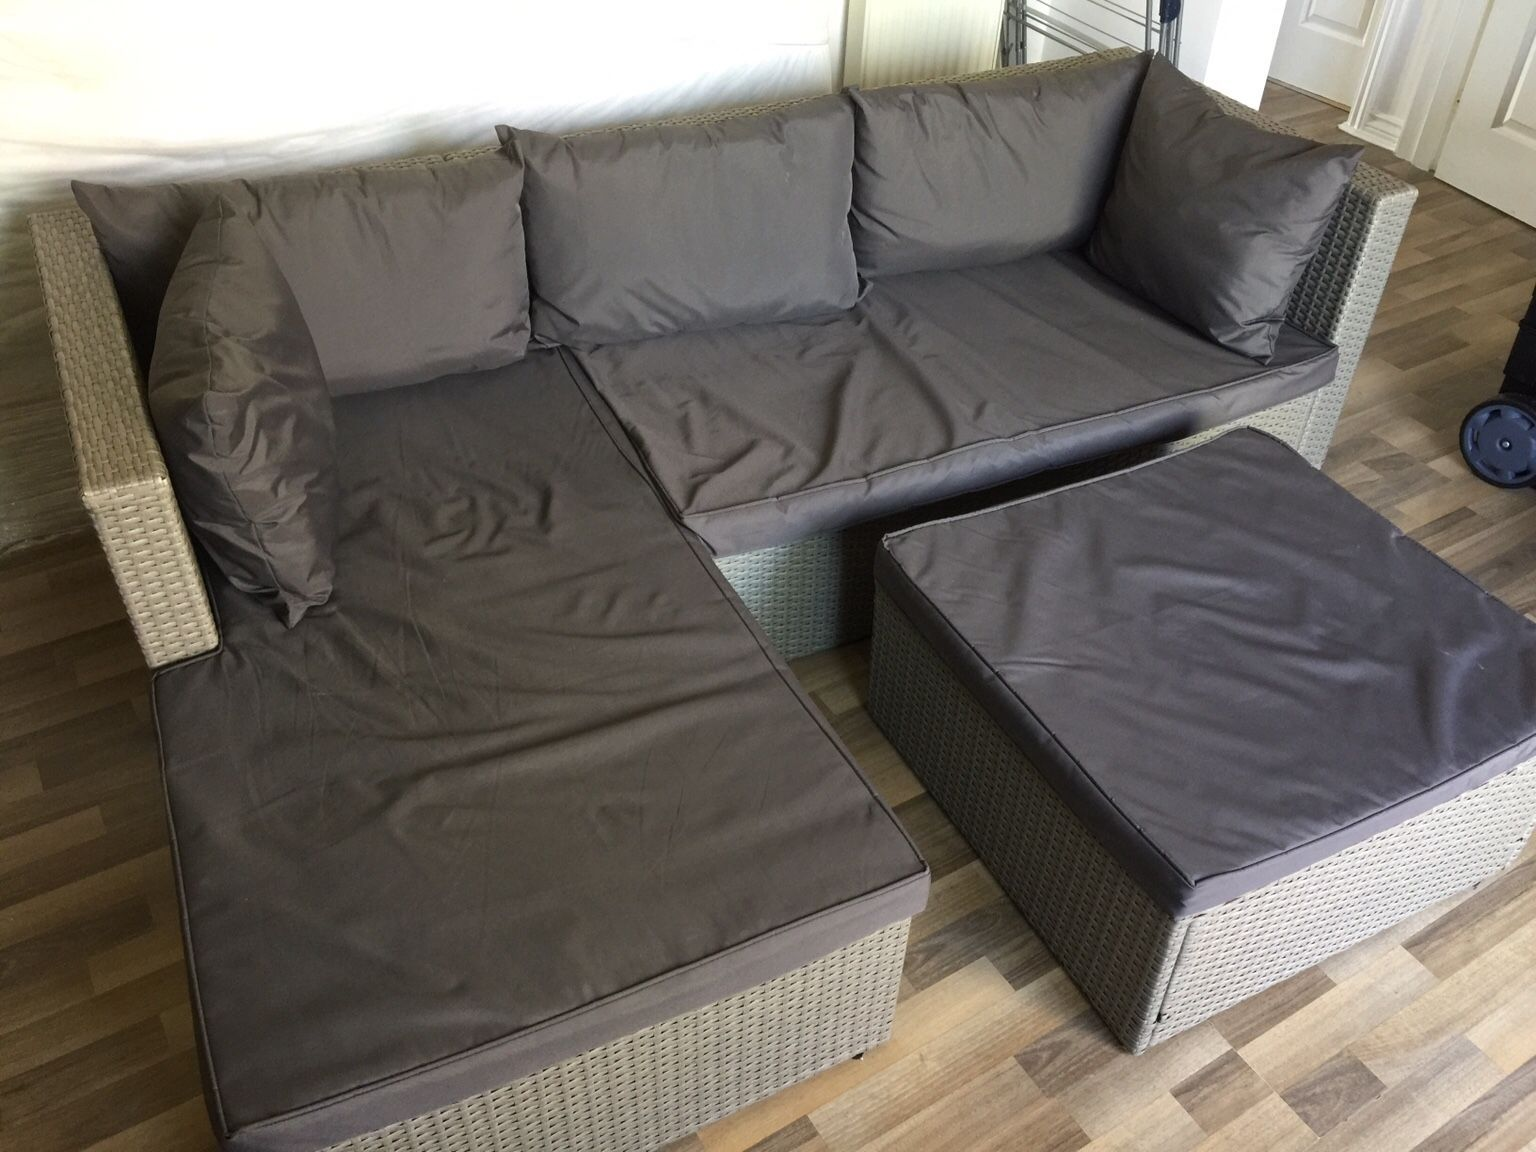 Aldi Rattan Effect Corner Sofa Cover In 2020 Corner Sofa Set Sofa Set Corner Sofa Covers